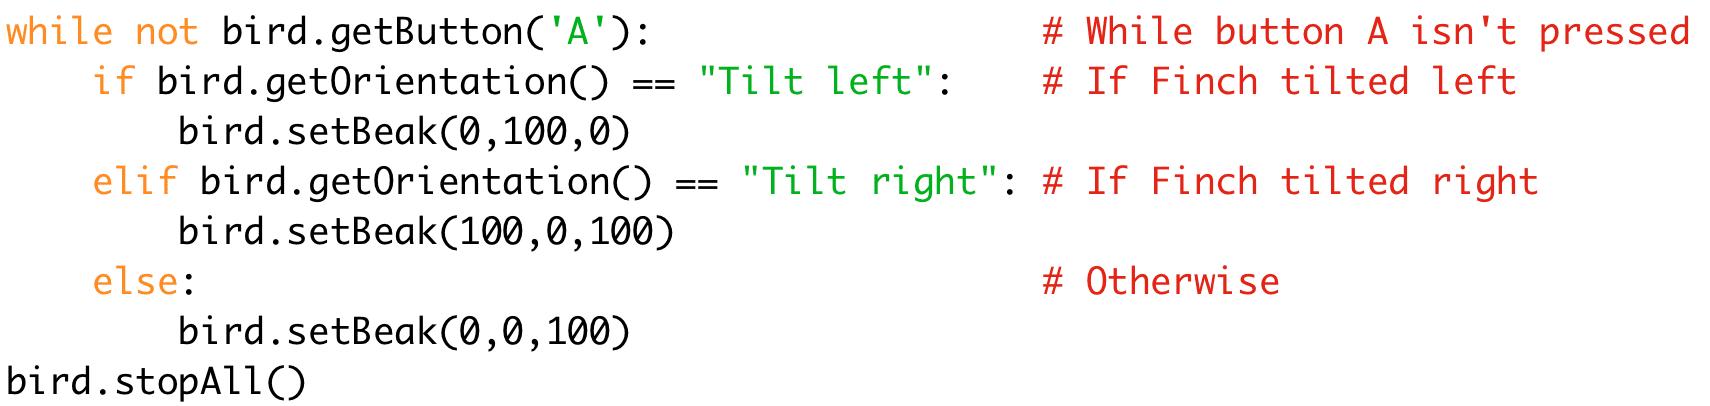 "while not bird.getButton('A'): # While button A isn't pressed  if bird.getOrientation() == ""Tilt left"": # If Finch tilted left  bird.setBeak(0,100,0)  elif bird.getOrientation() == ""Tilt right"": # If Finch tilted right  bird.setBeak(100,0,100)  else: # Otherwise  bird.setBeak(0,0,100)  bird.stopAll()"